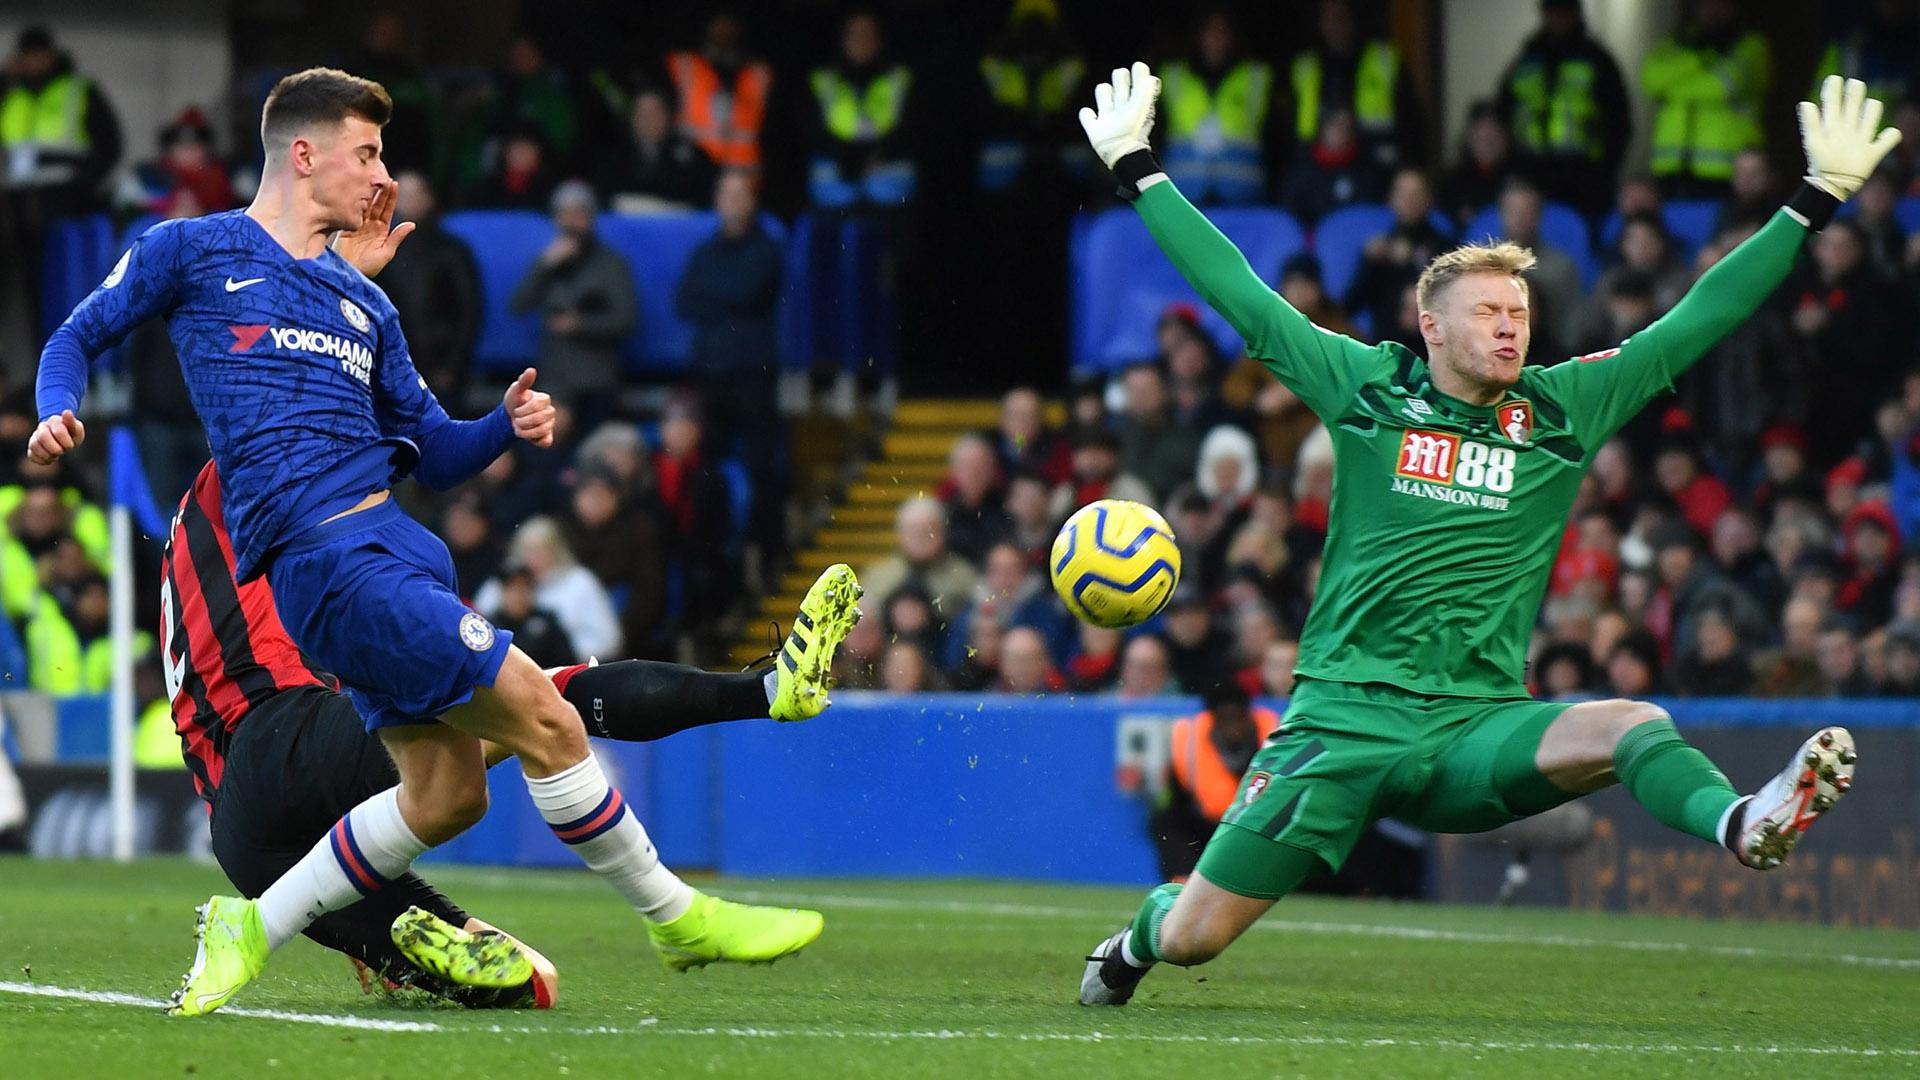 Bournemouth keeper Ramsdale backs Premier League restart after positive coronavirus test